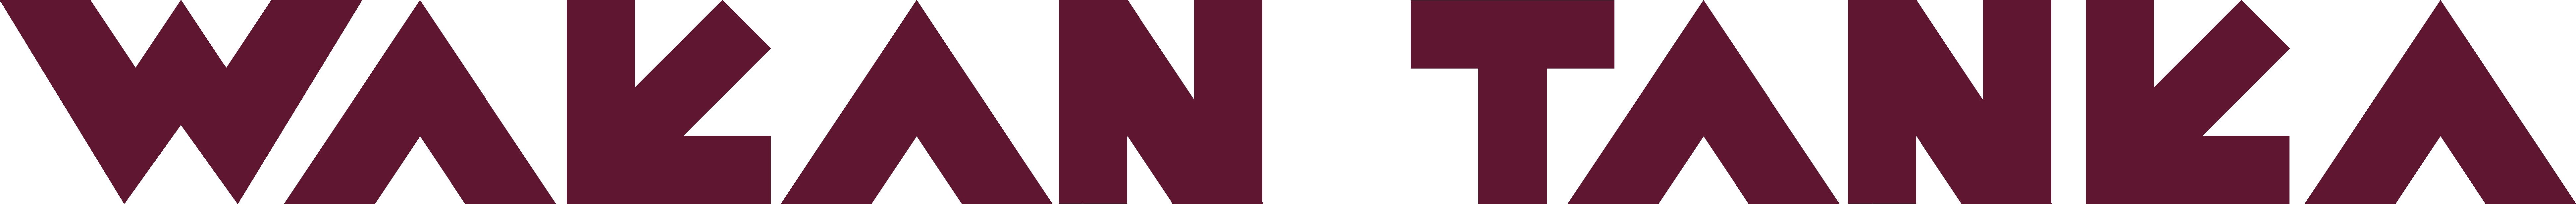 Logo Wakan Tanka par Gwen Tomahawk Graphiste Fontainebleau